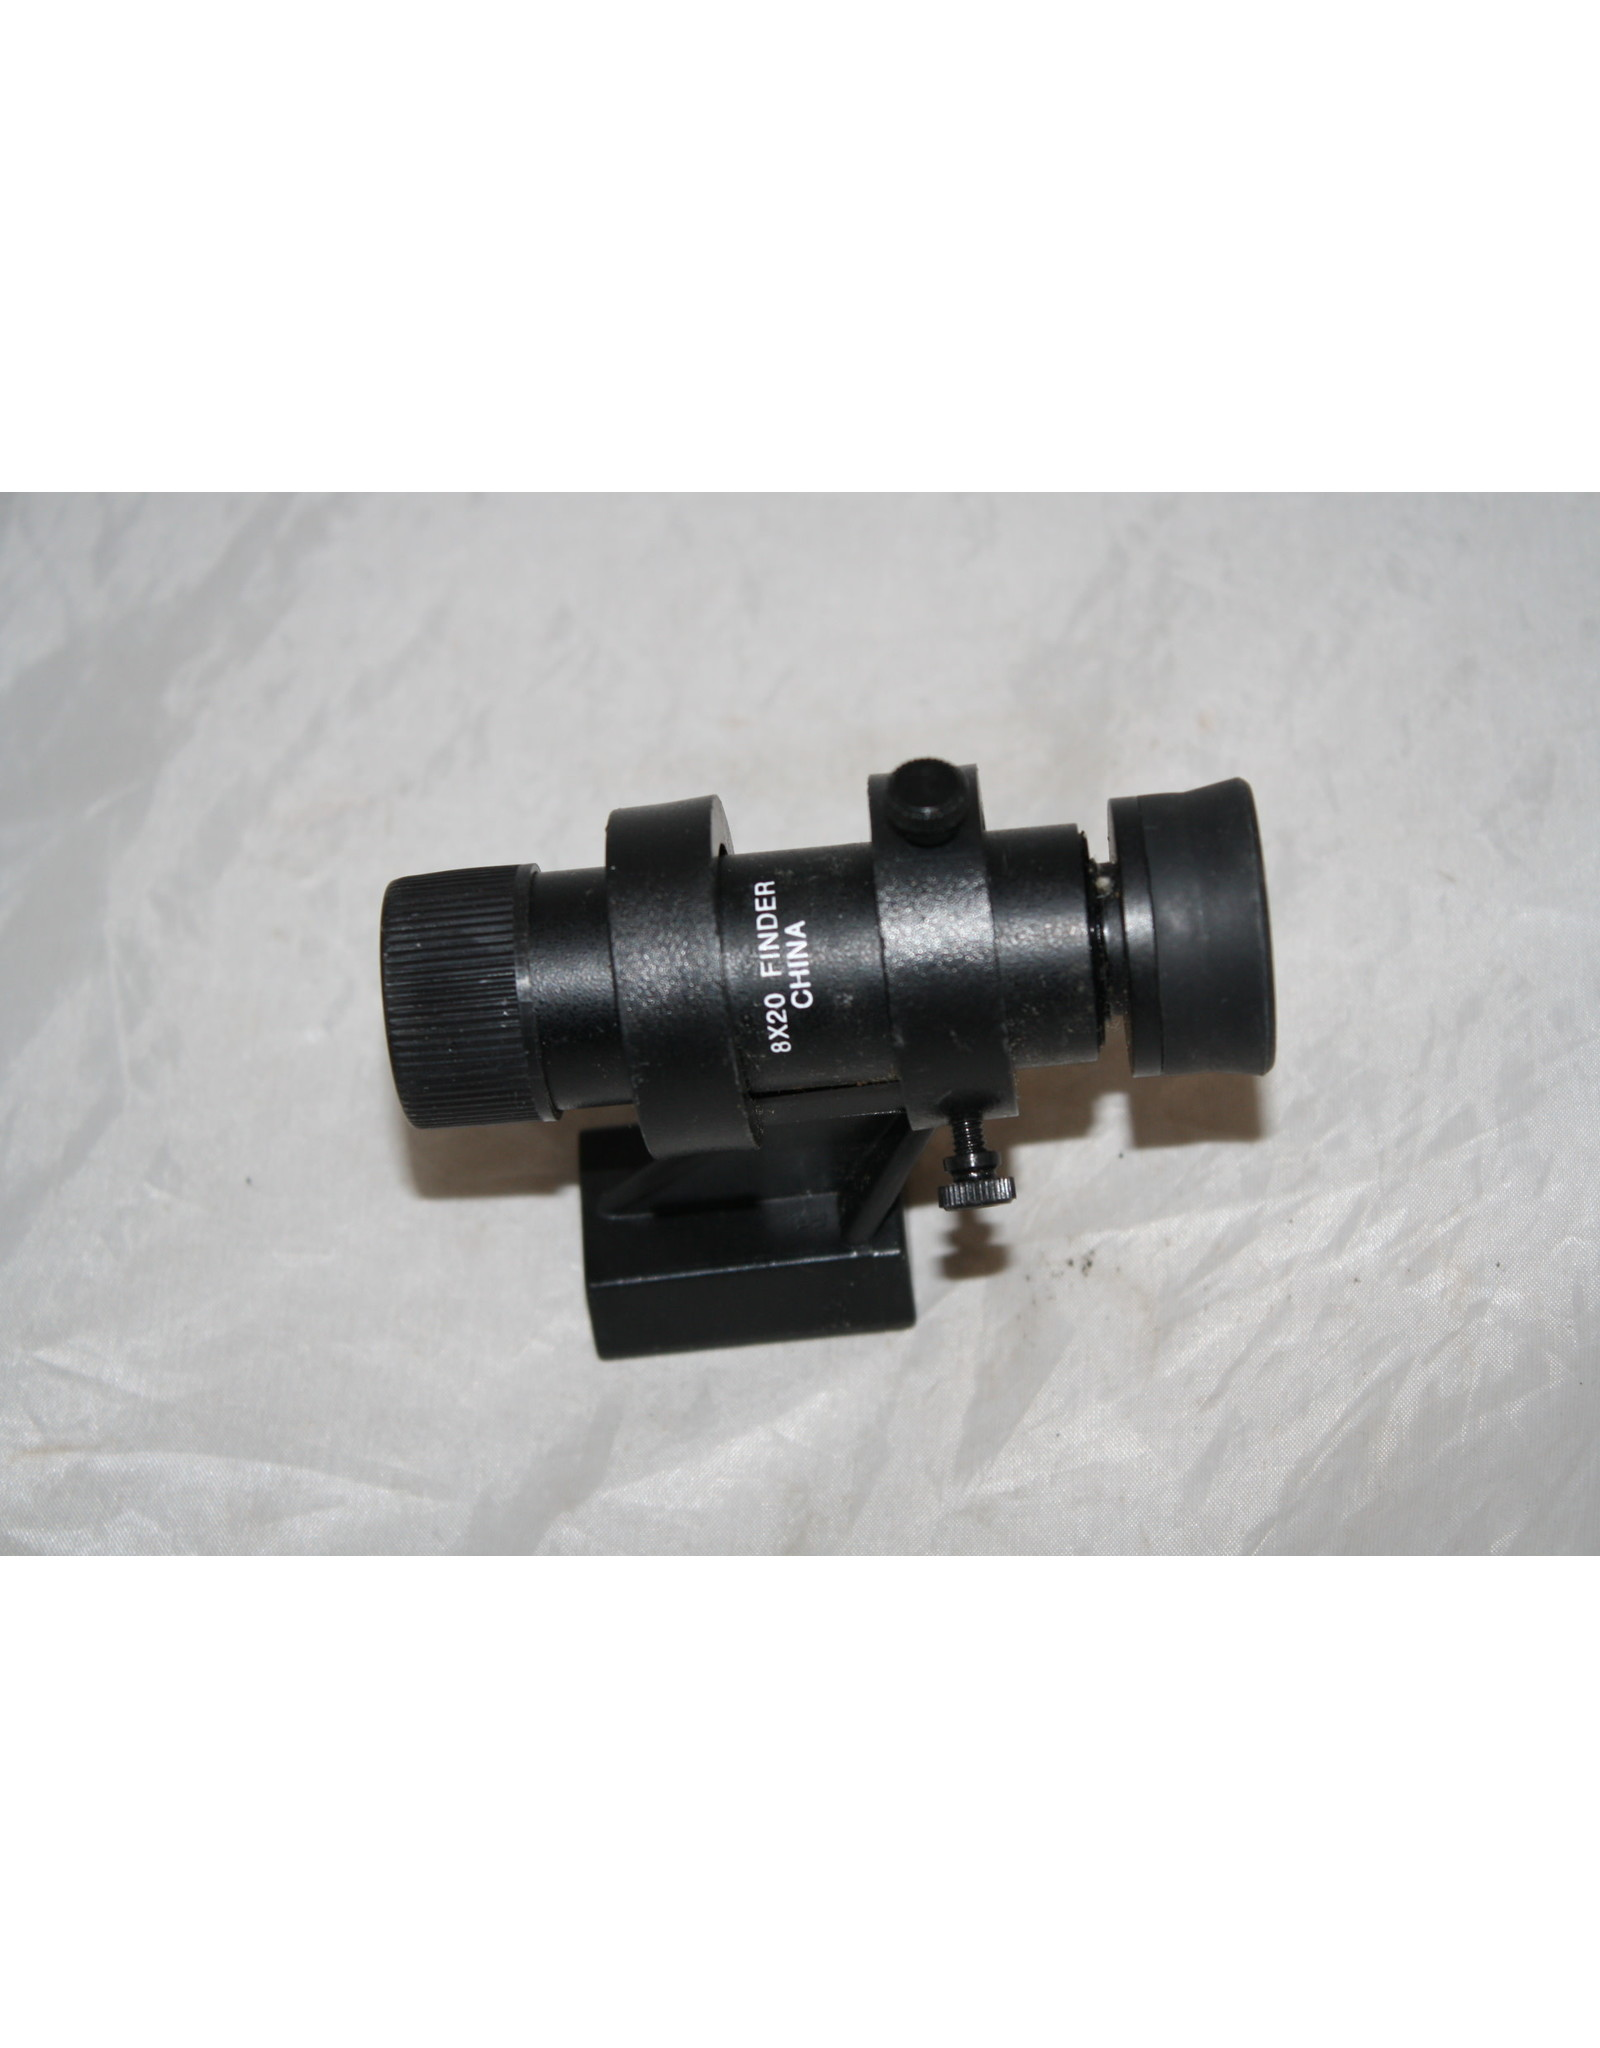 Celestron 8x20 finderscope with Bracket for Vixen Base